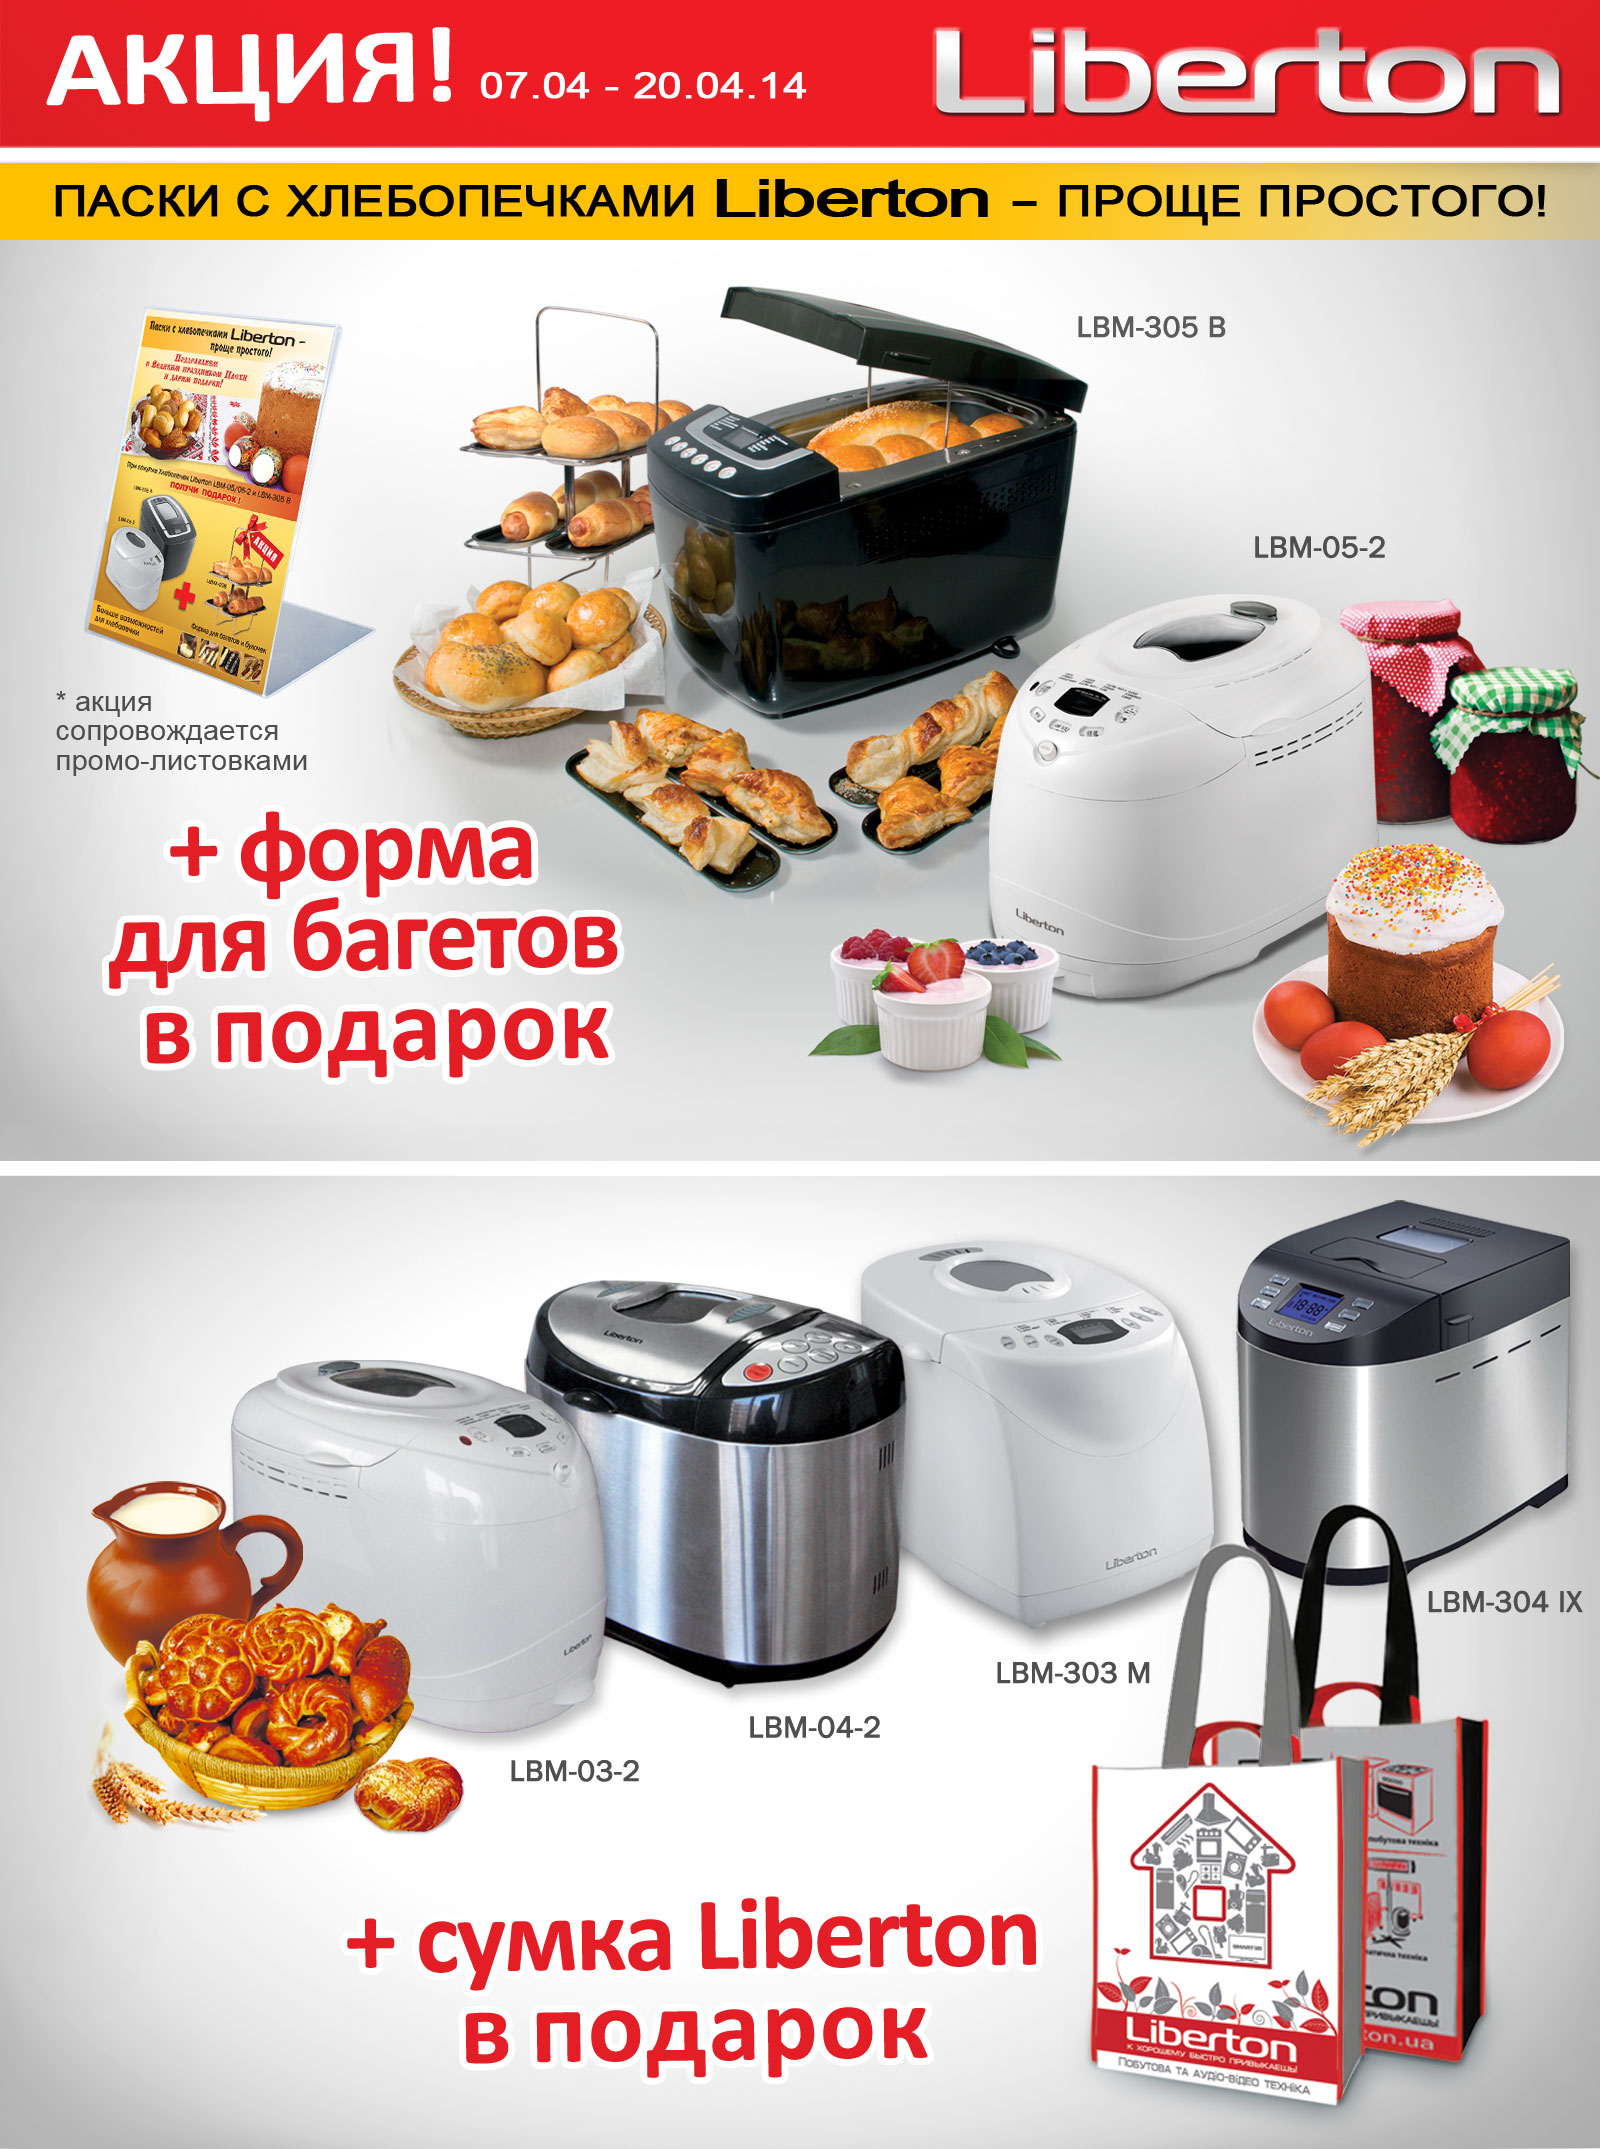 Рецепты багетов для хлебопечки